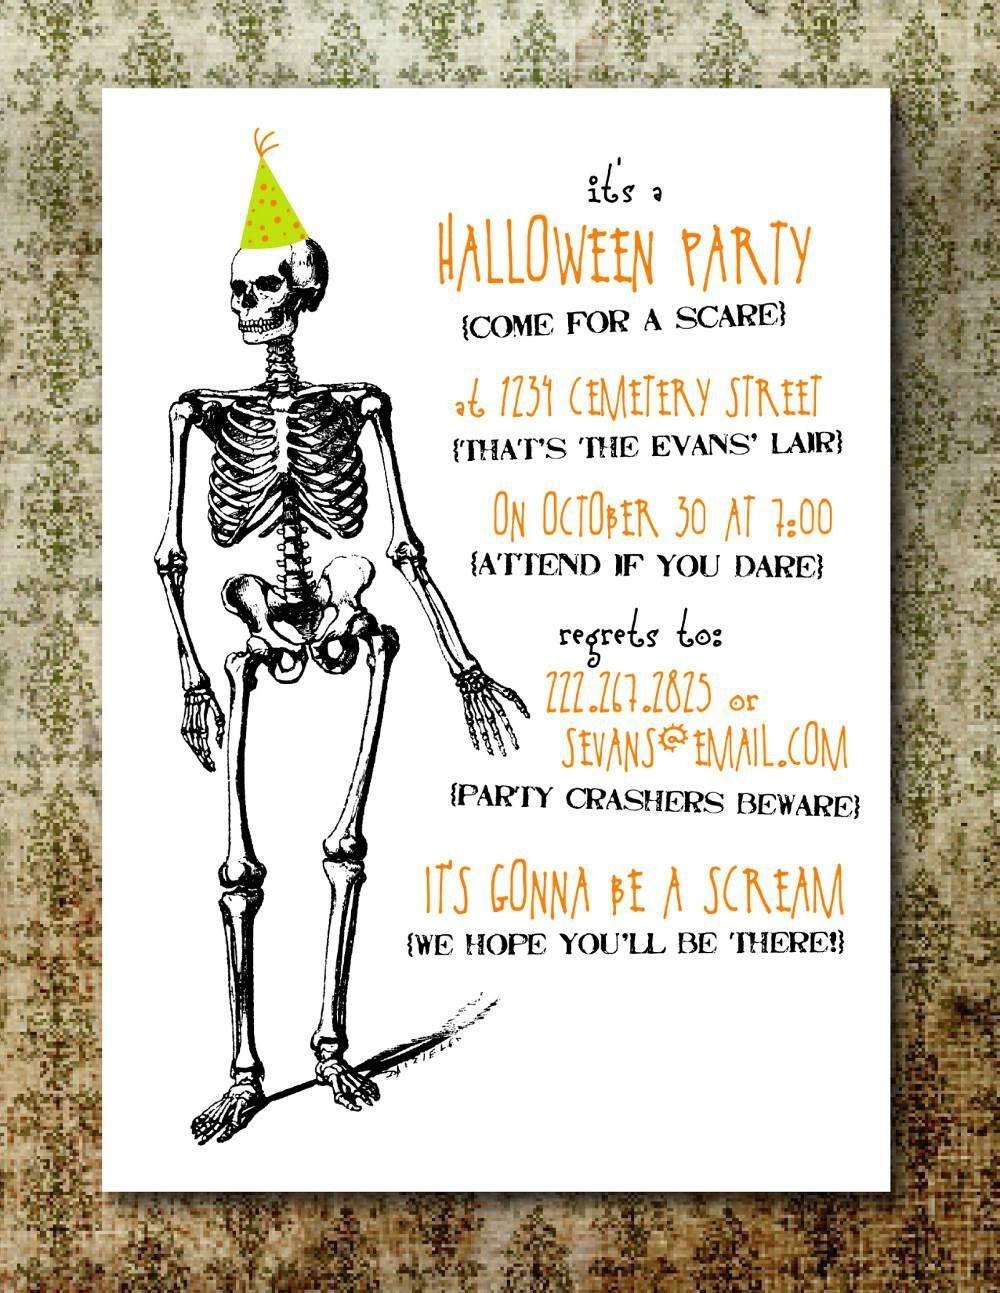 Free Printable Halloween Invitation Templates   Free Printable - Free Halloween Birthday Invitation Templates Printable